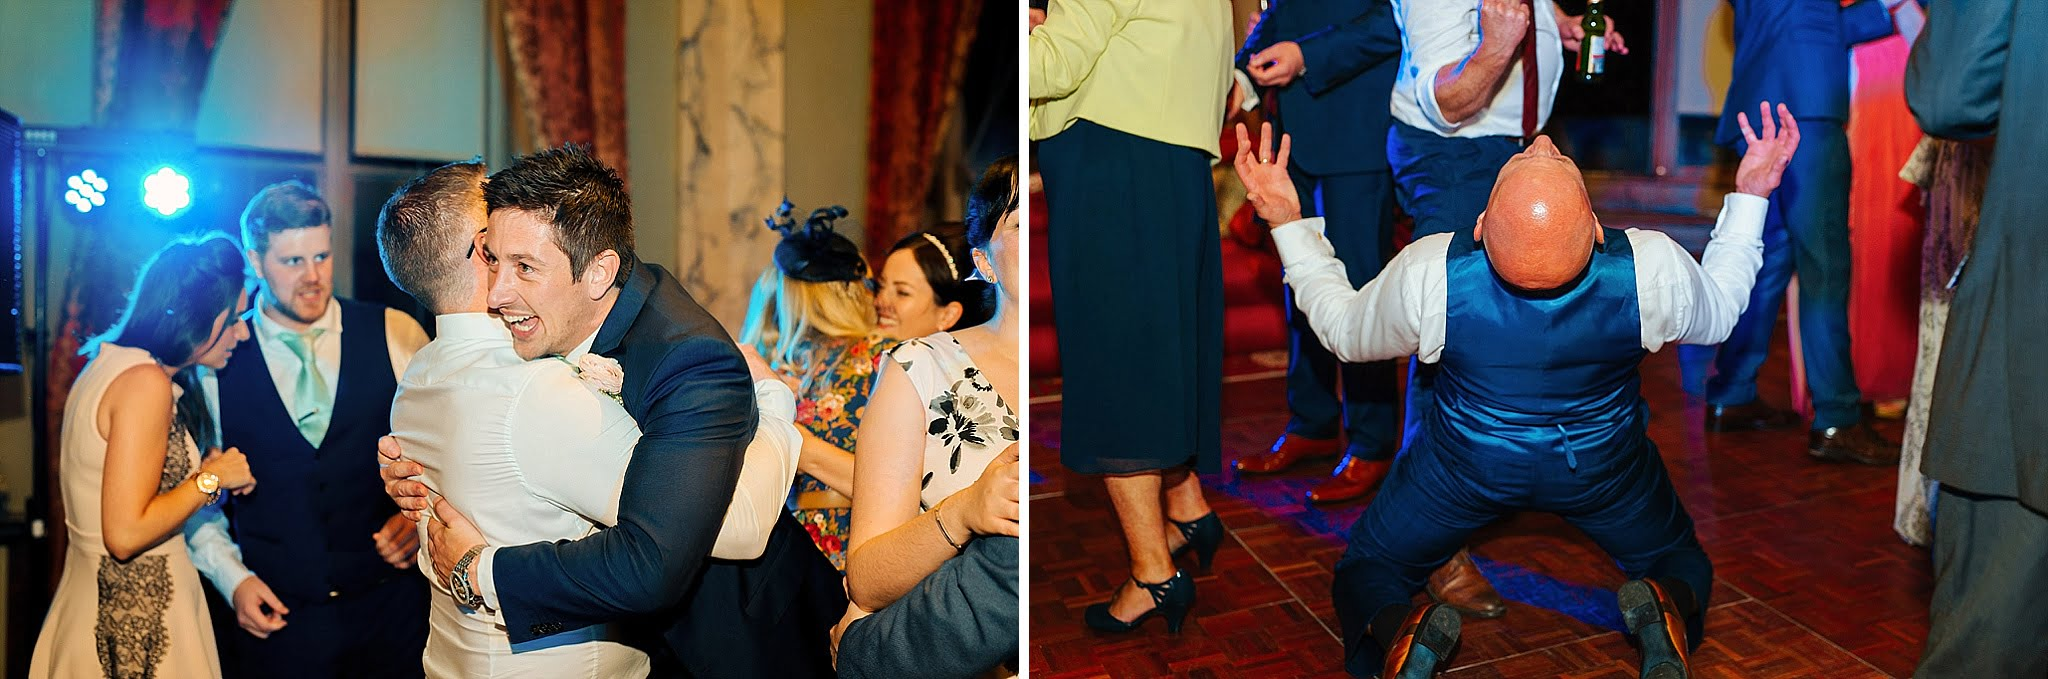 Eastnor Castle wedding photographer Herefordshire, West Midlands - Sarah + Dean 64